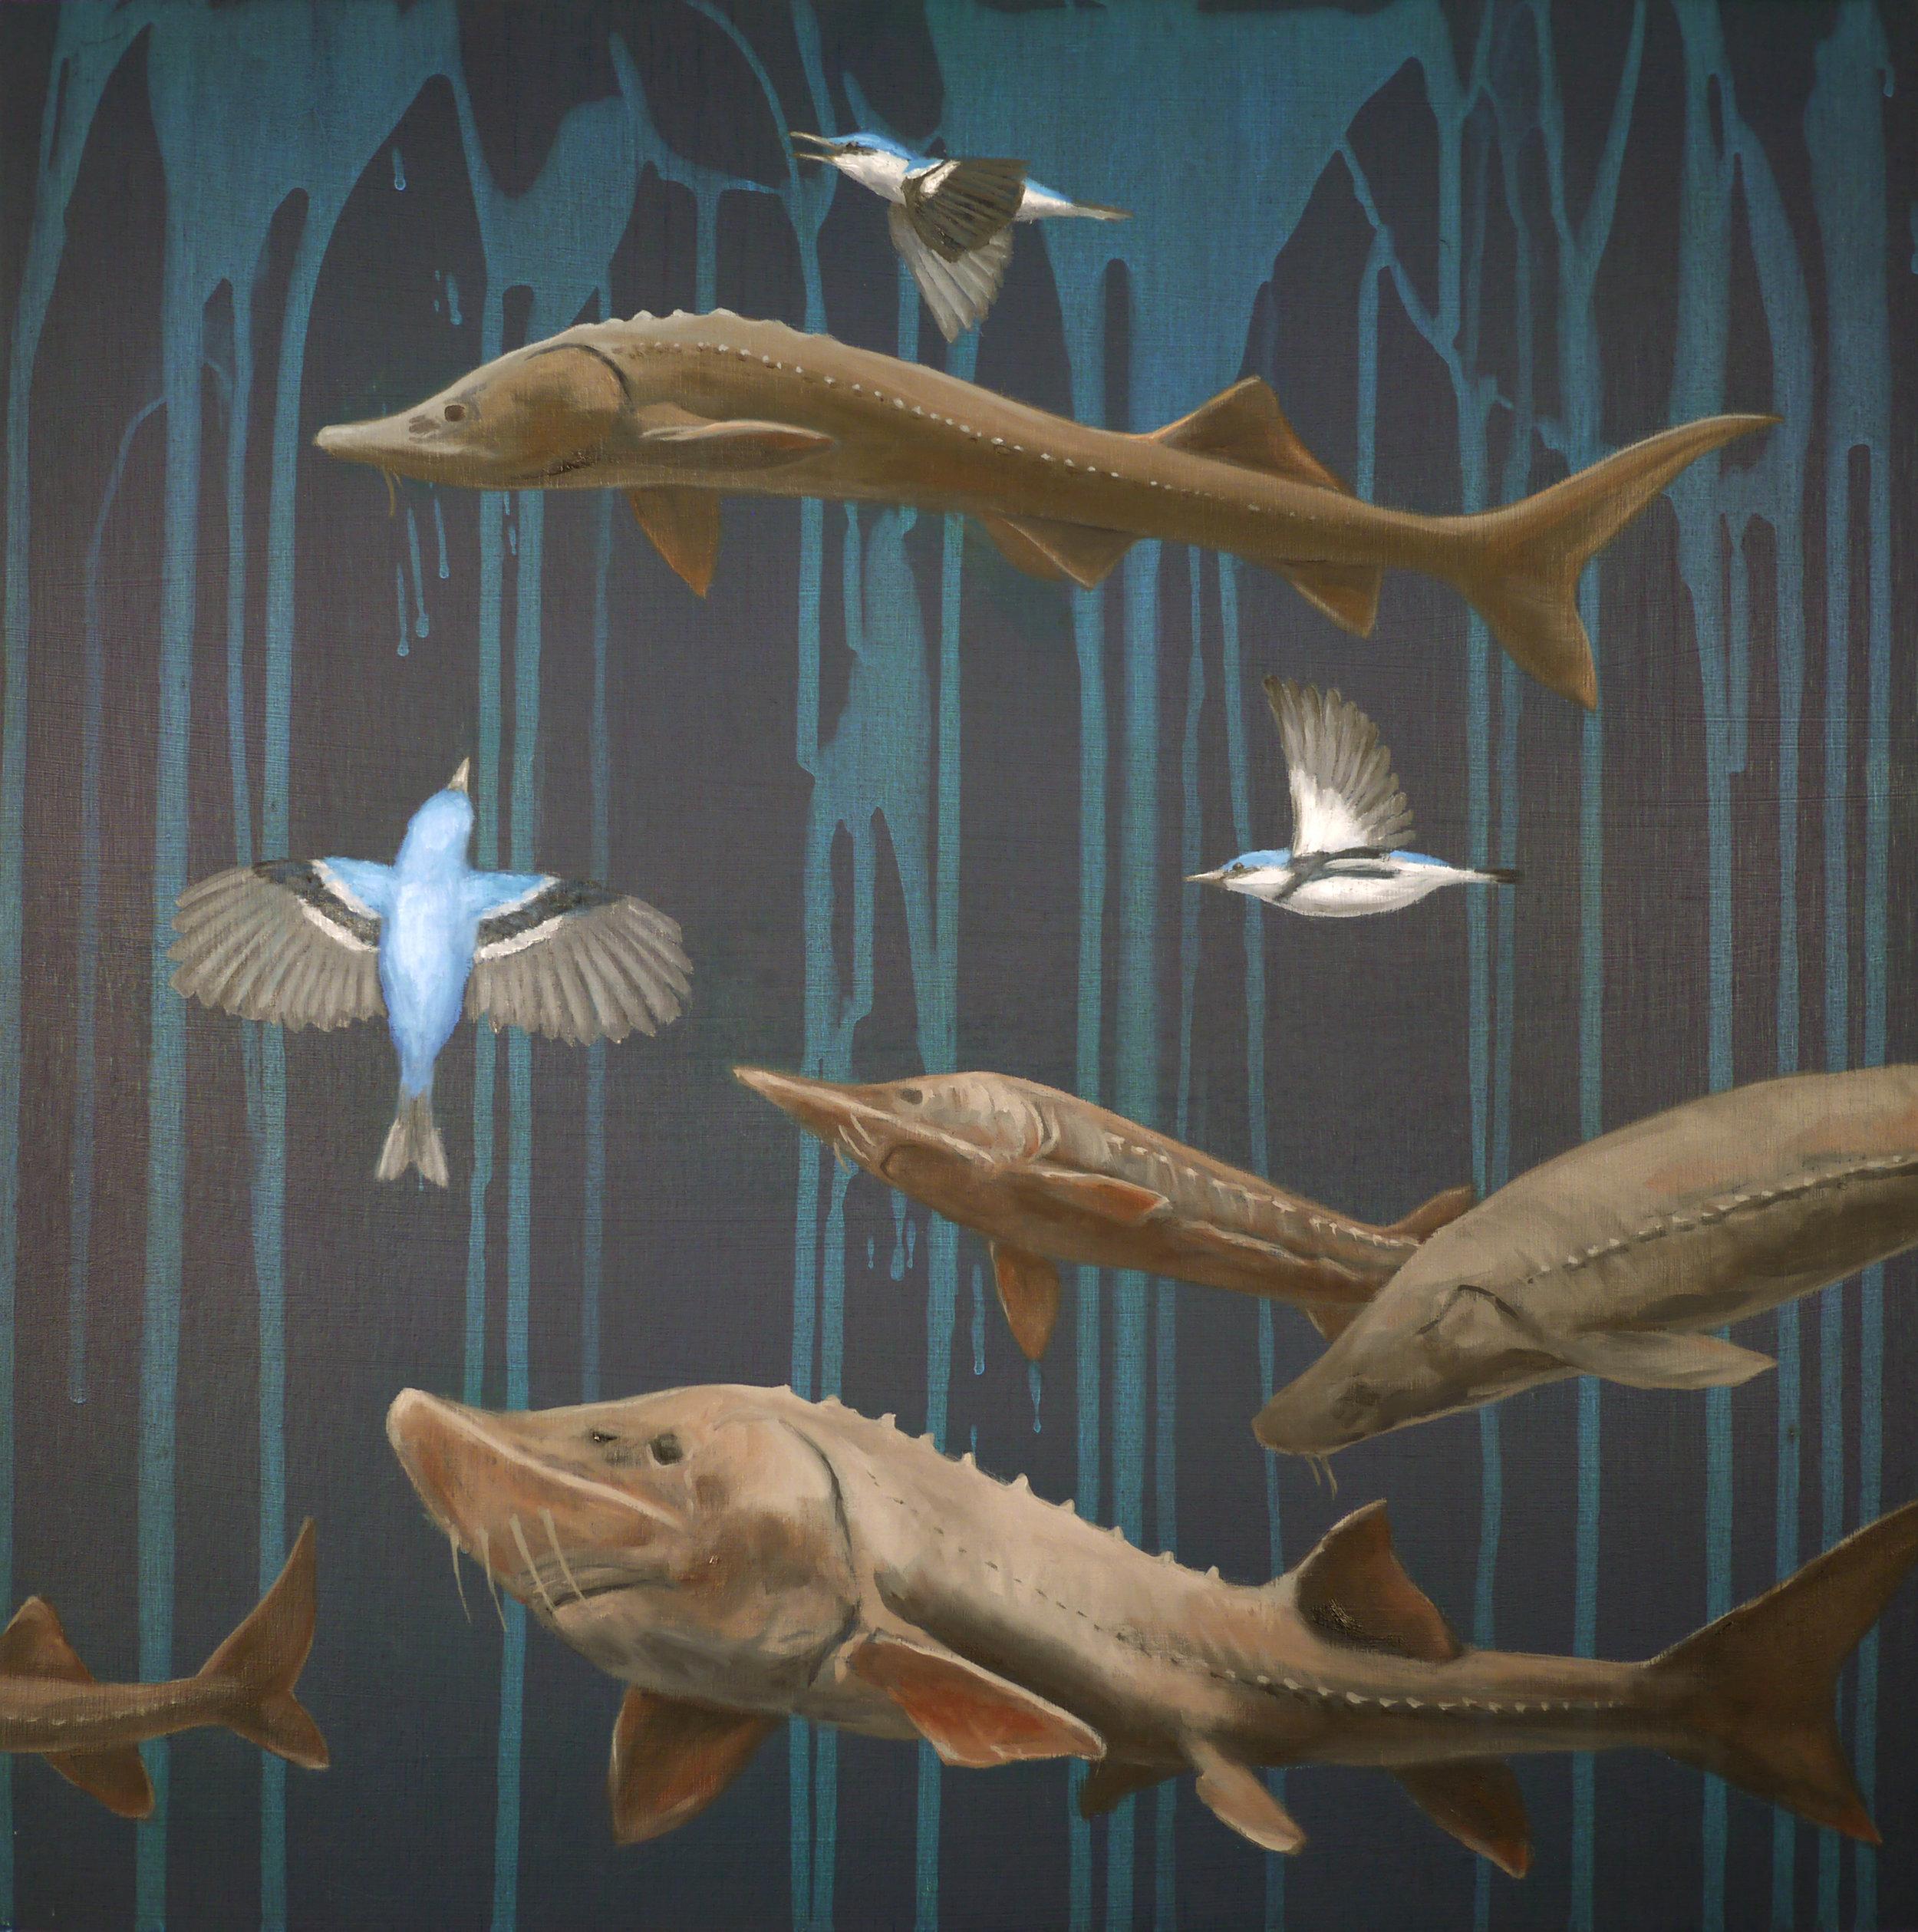 An Ancient Migration